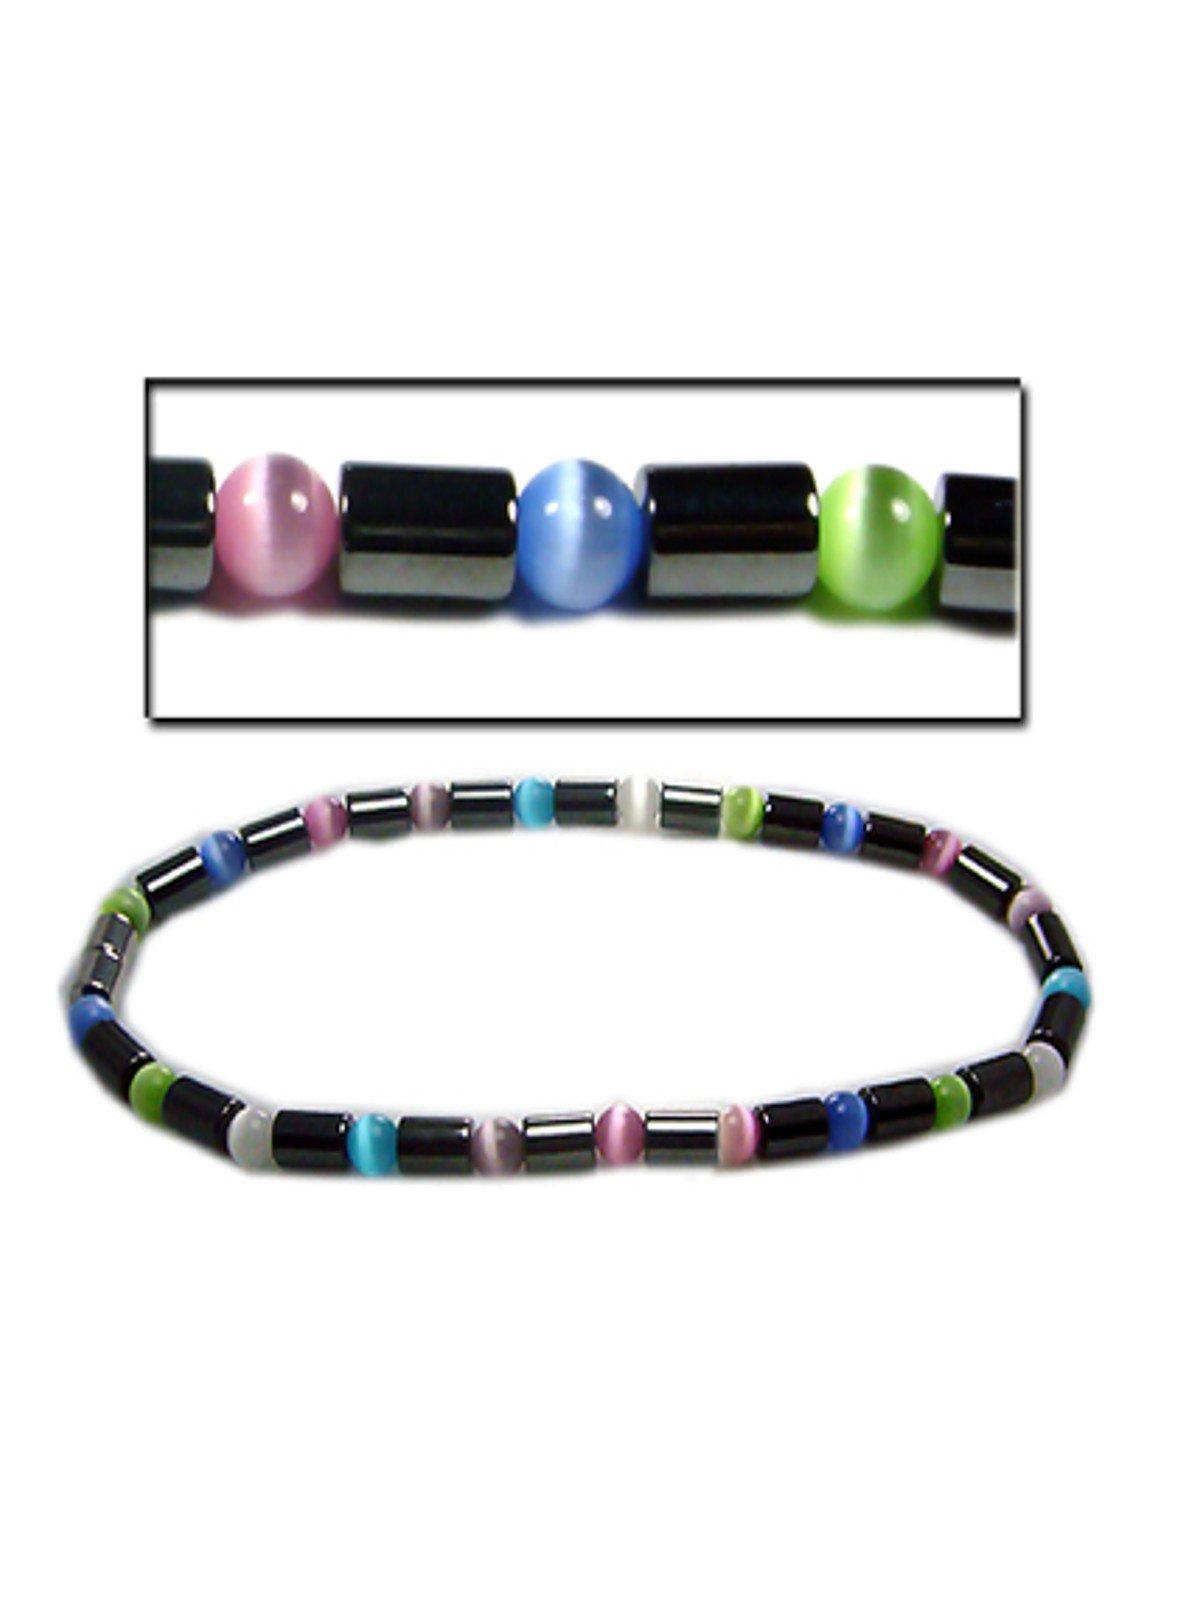 Accents Kingdom Women's Magnetic Hematite Color Cats Eye Bead Anklet Bracelet, 10''